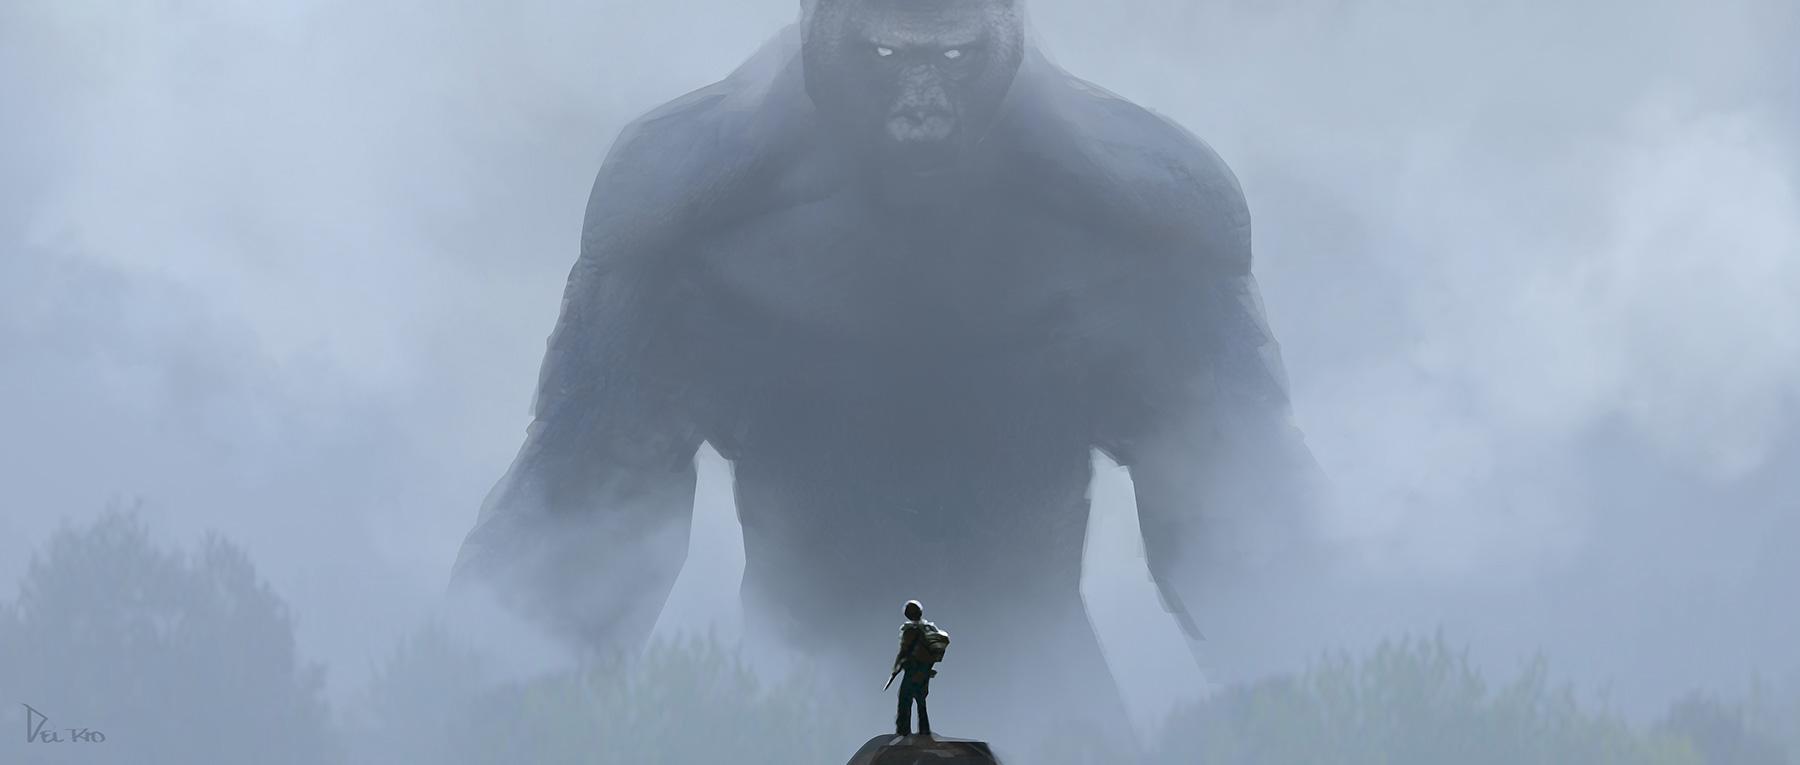 Kong: Skull Island Concept Art by Eddie Del Rio